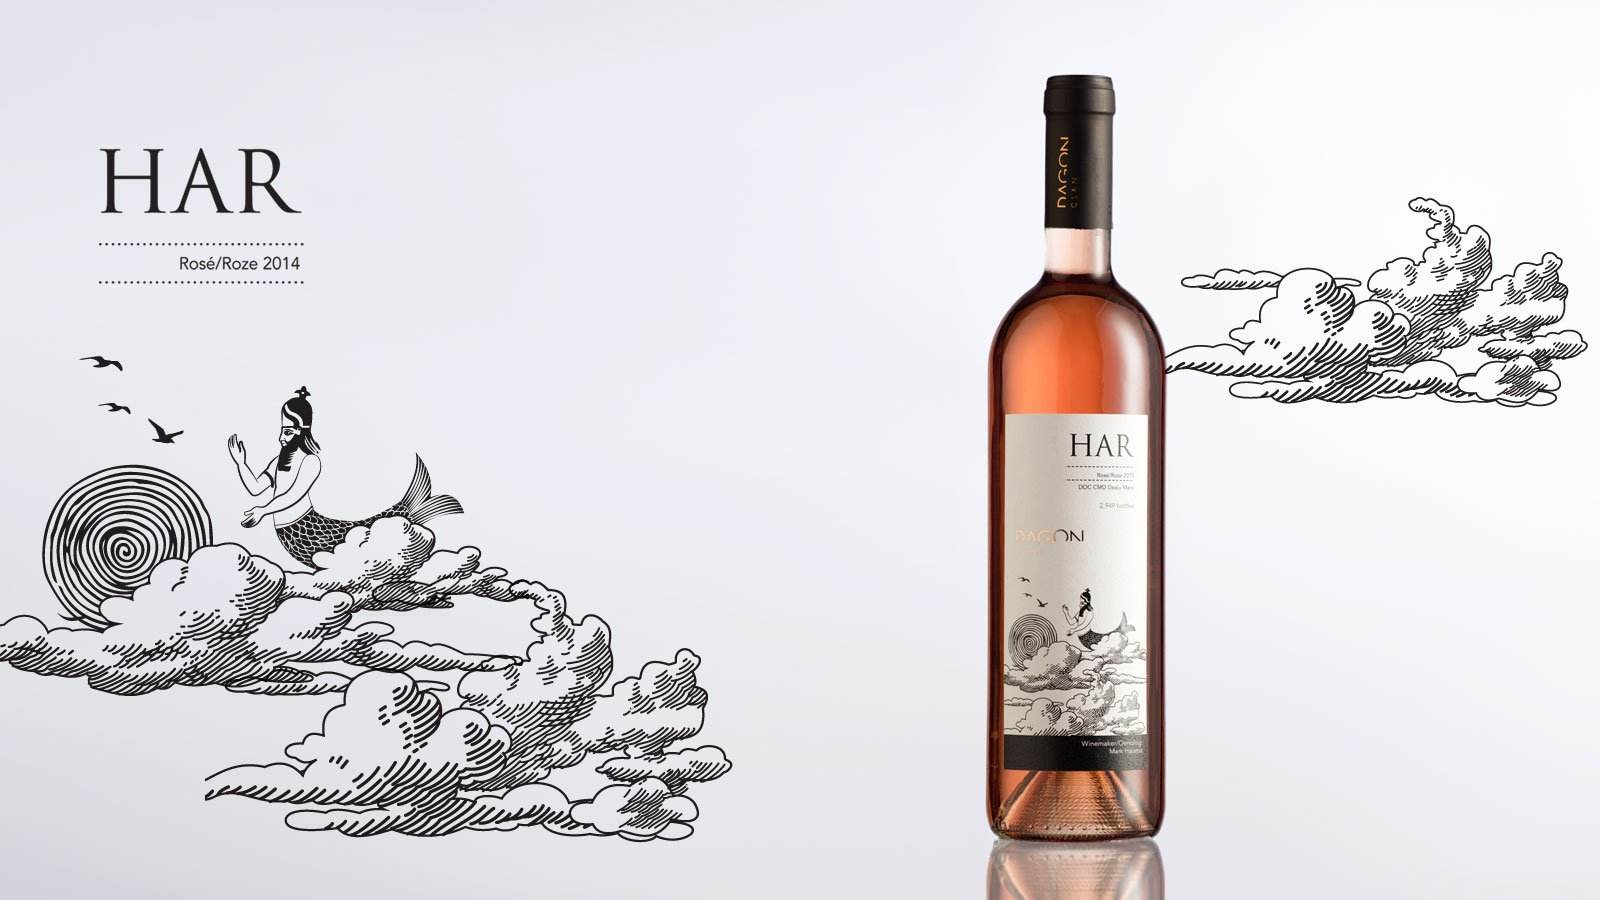 Sticla de vin Har